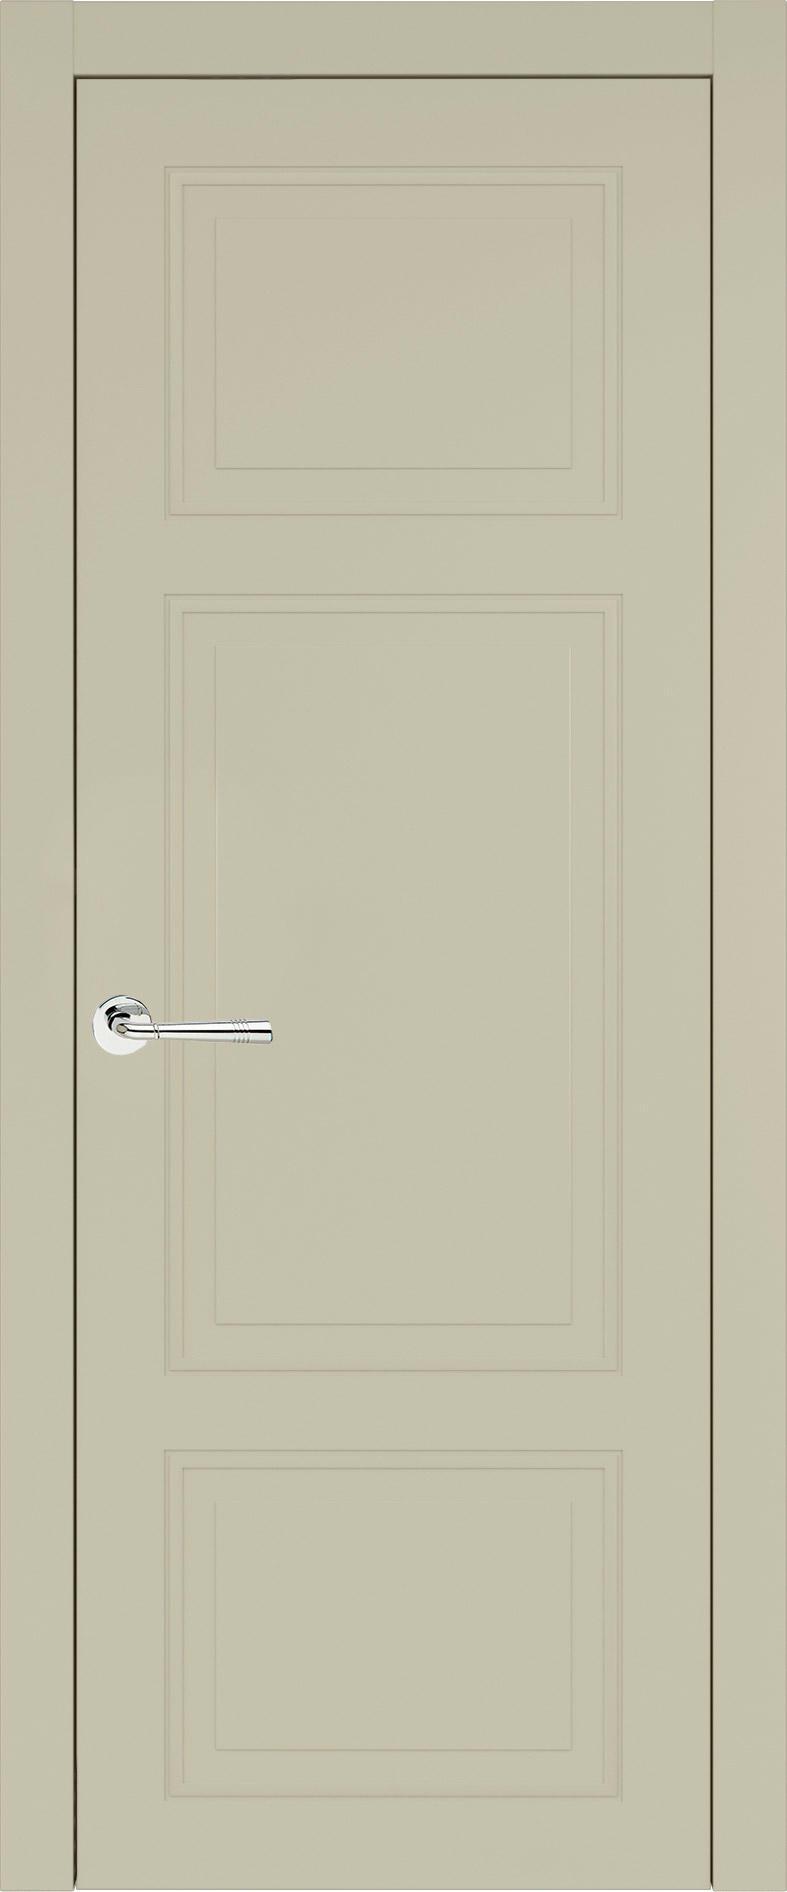 Siena Neo Classic цвет - Серо-оливковая эмаль (RAL 7032) Без стекла (ДГ)